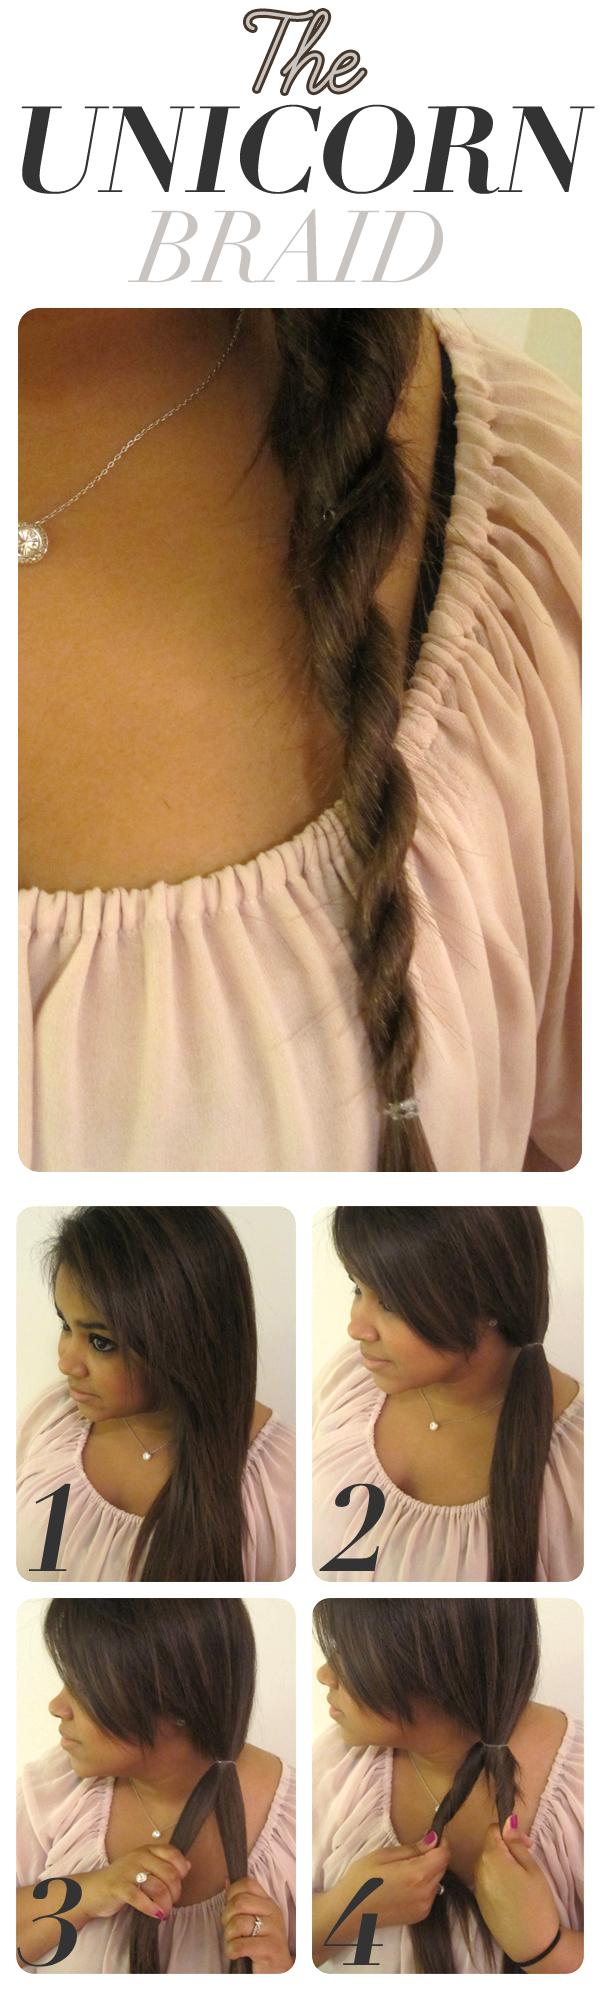 The unicorn braid jnvfsjdvnfn pinterest hair braids and